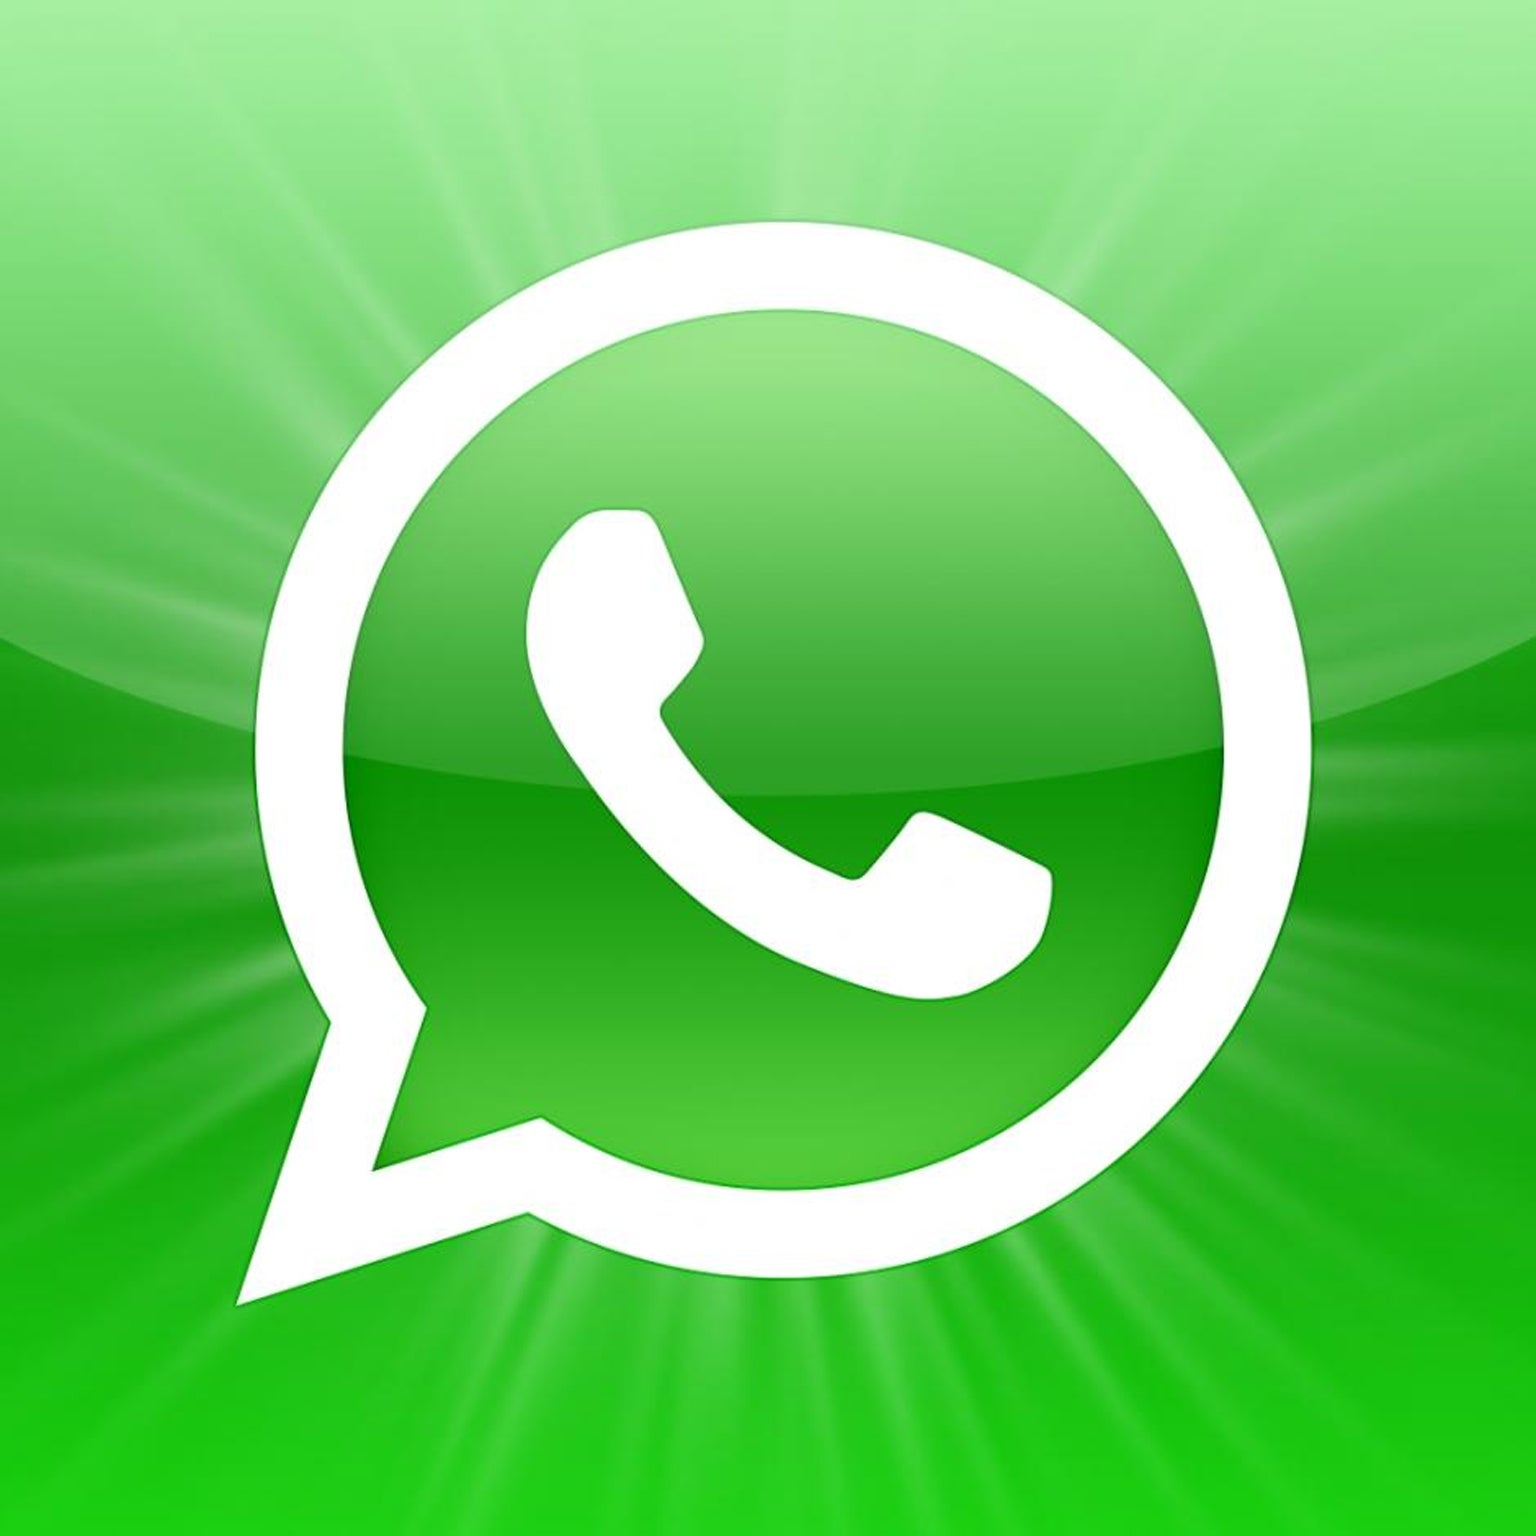 WhatsApp Denies Google U0026 39 S 1bn Takeover Bid Rumours The